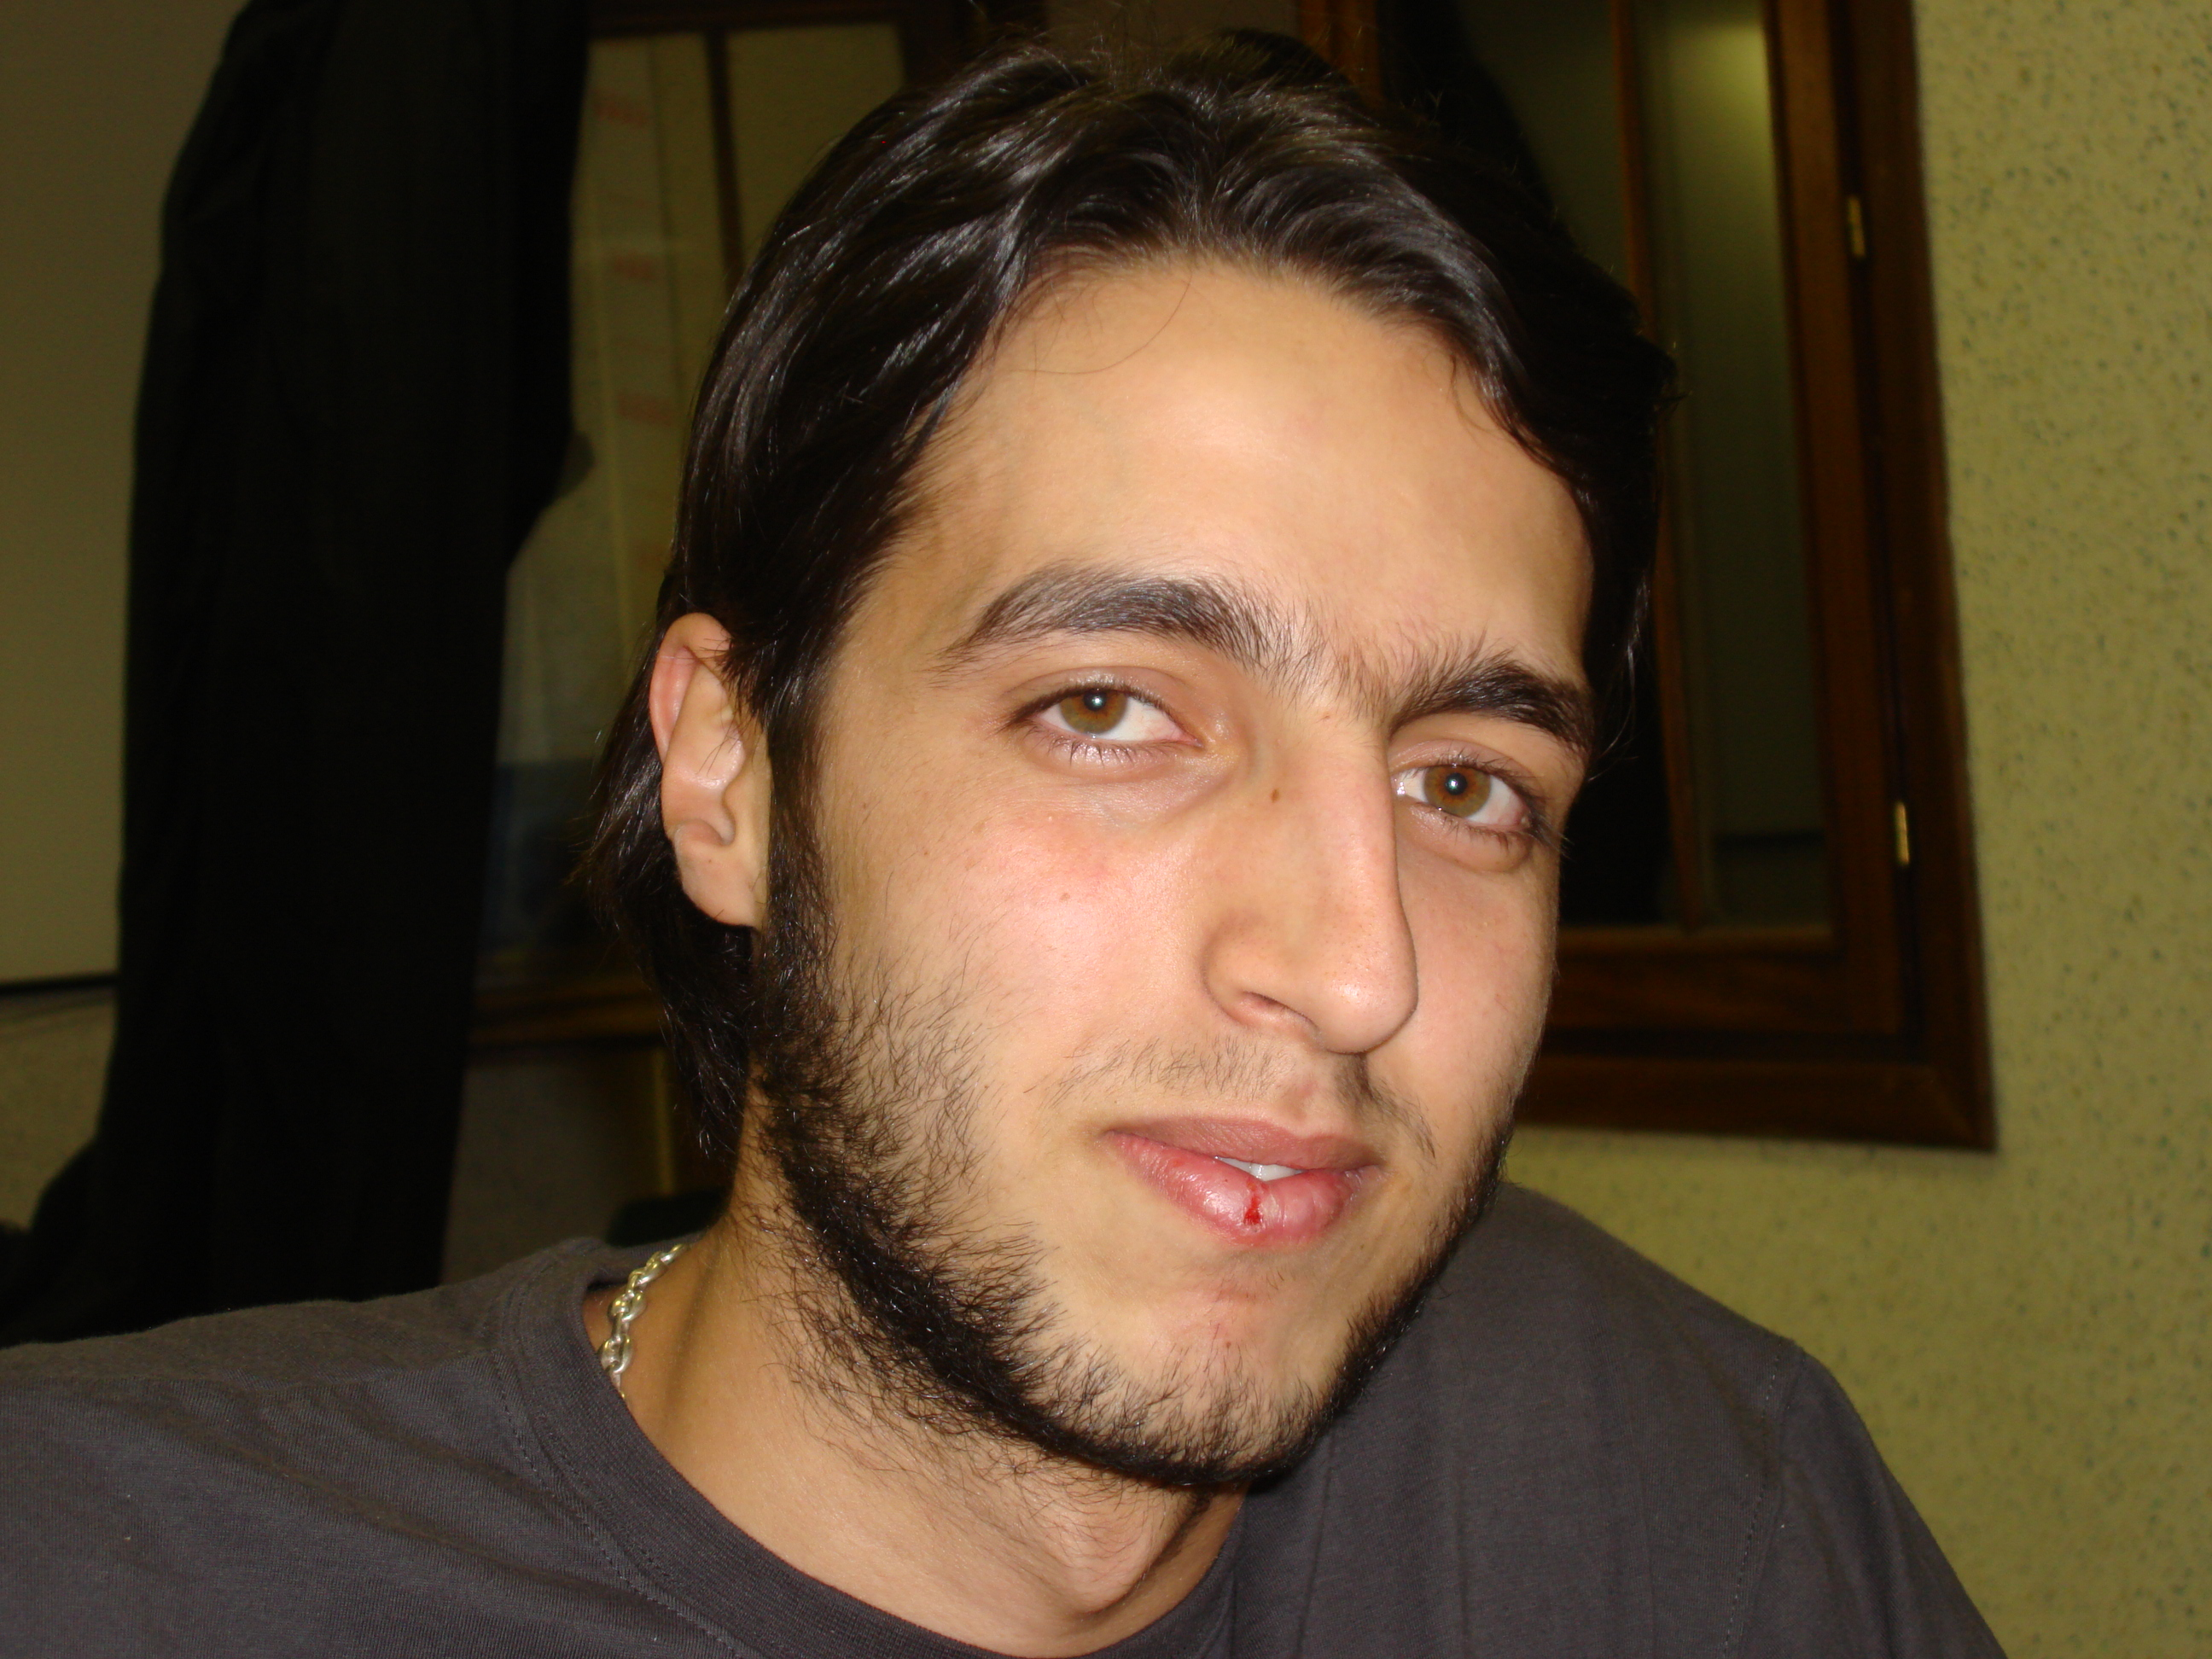 Khademallah, Yassir